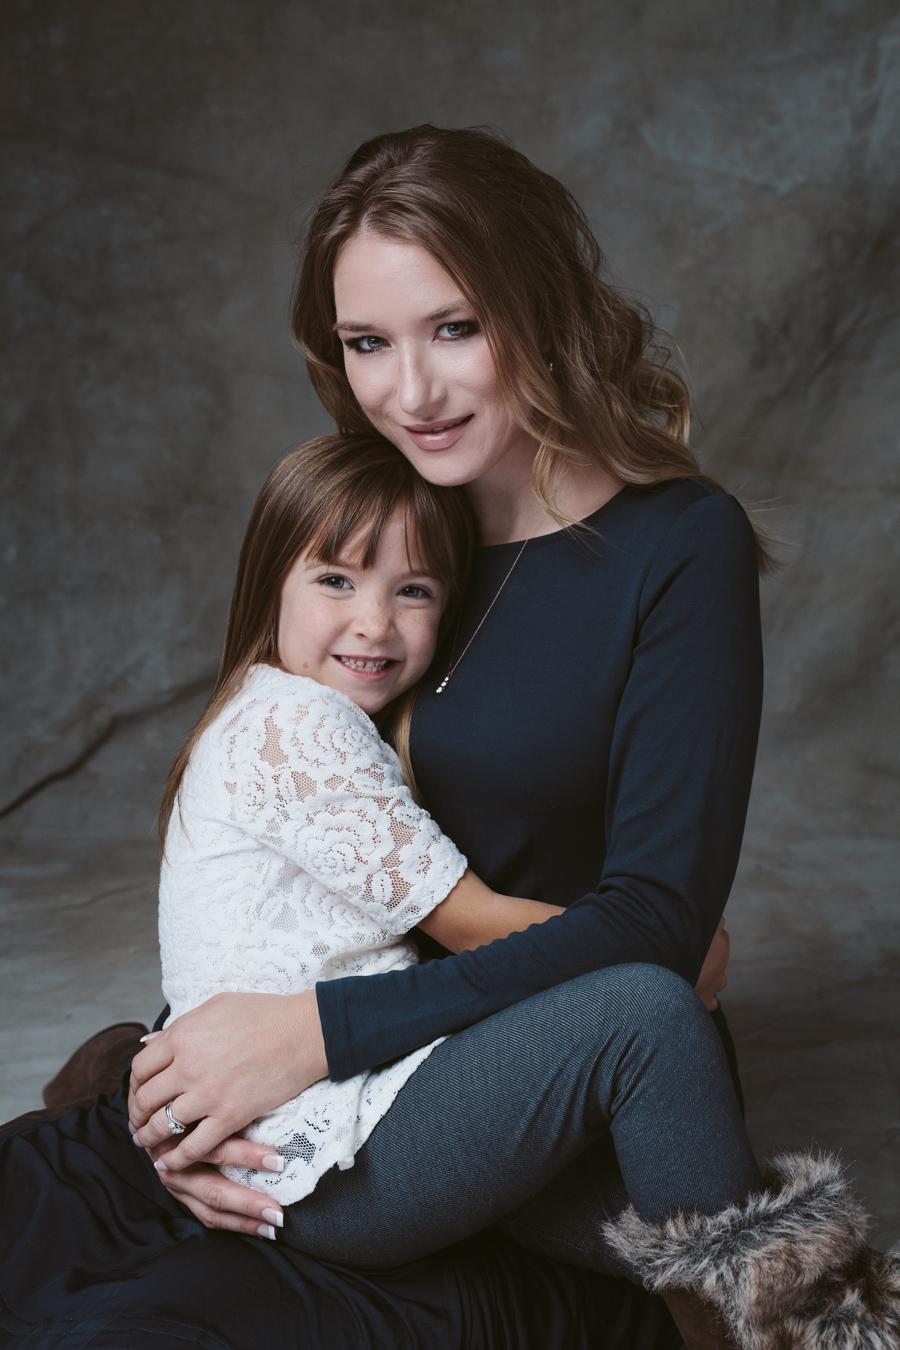 anna_kraft_photography_georgetown_square_studio_family_portrait-1.jpg